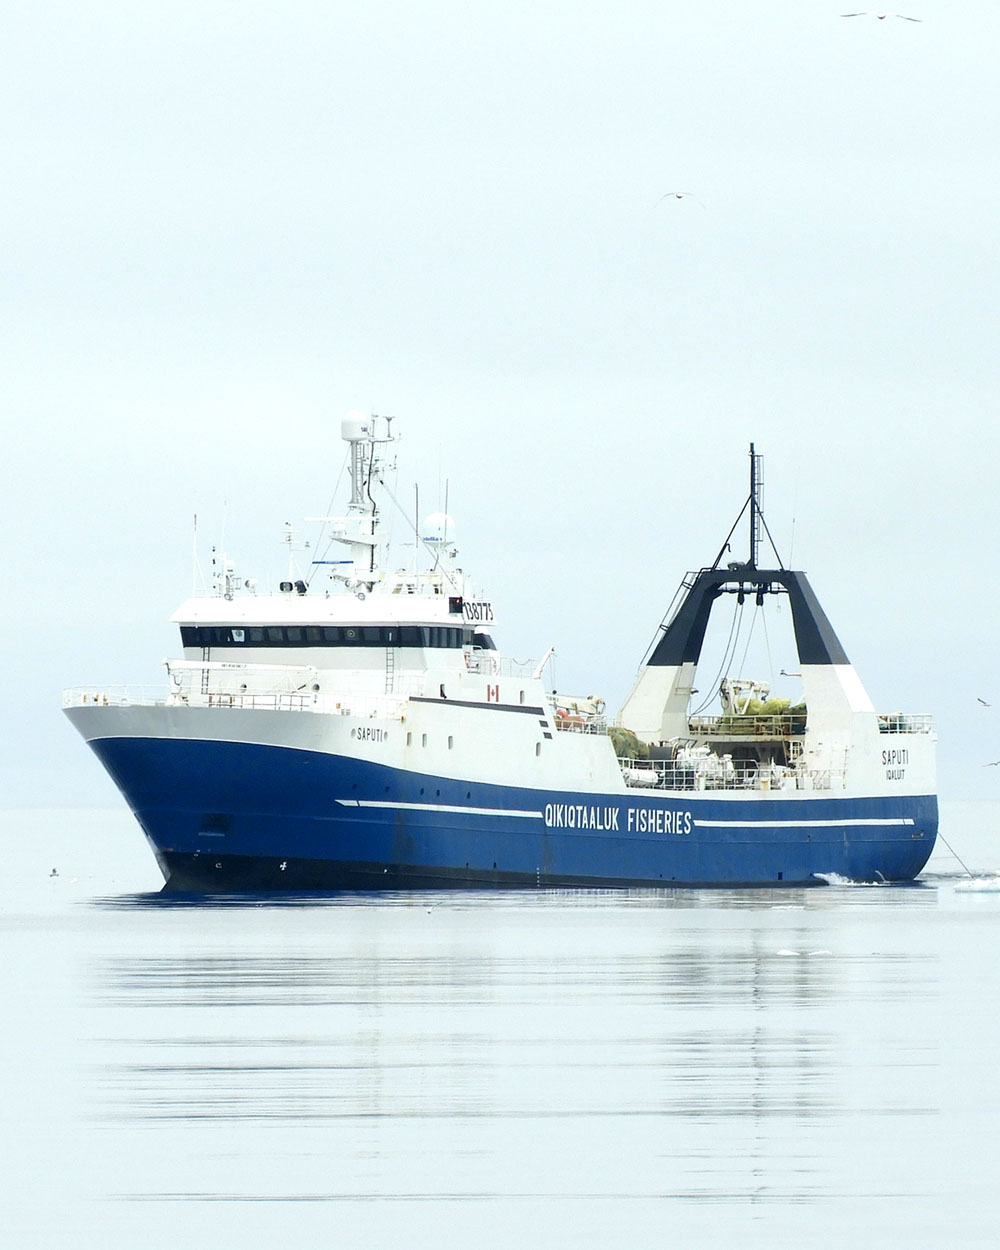 Saputi QFC Partner vessel of Sirena Group